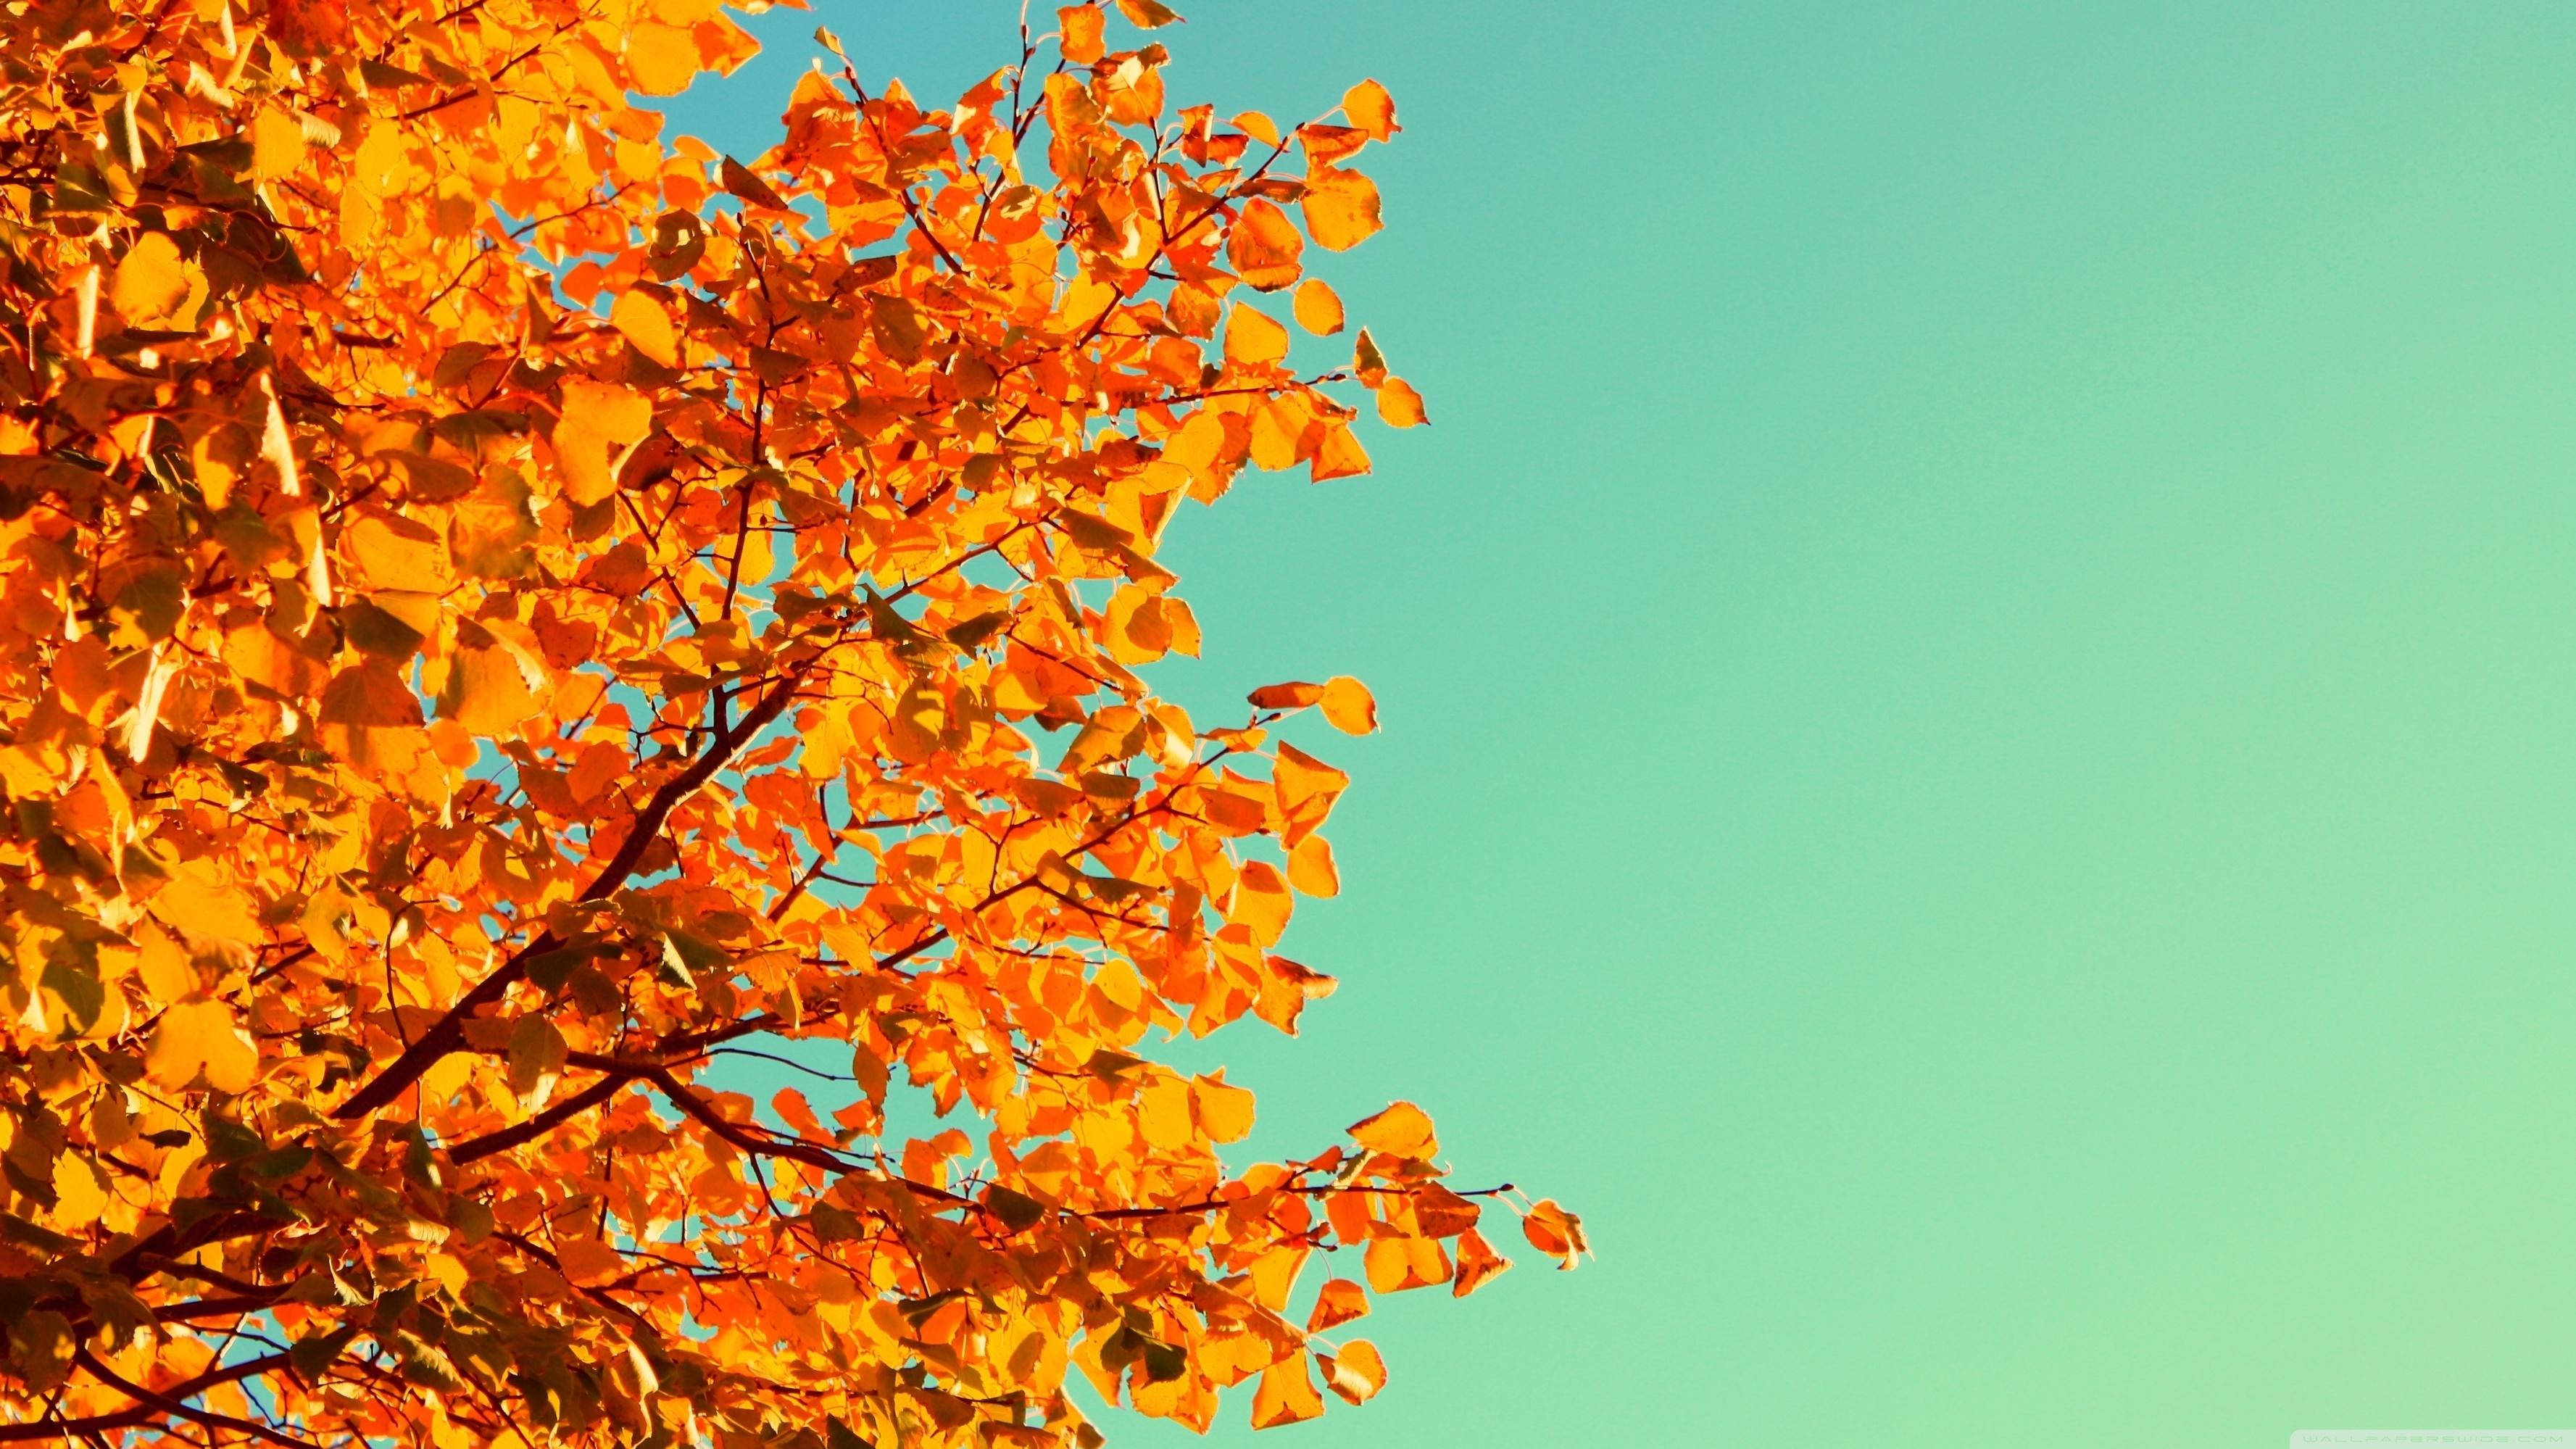 autumn colors ❤ 4k hd desktop wallpaper for 4k ultra hd tv • wide